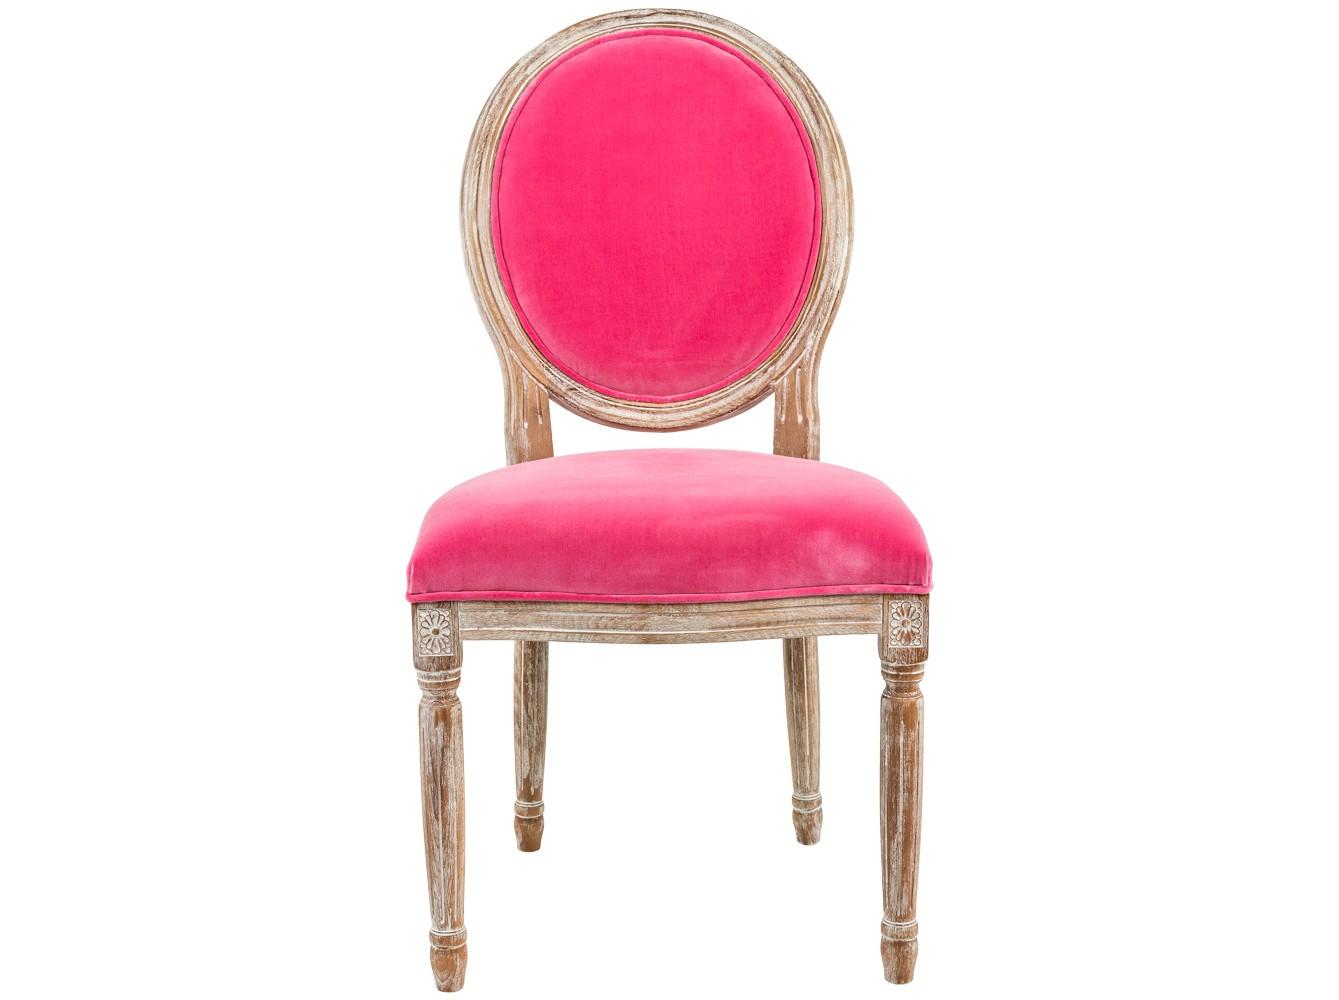 Кухонный стул Object Desire 15438278 от thefurnish